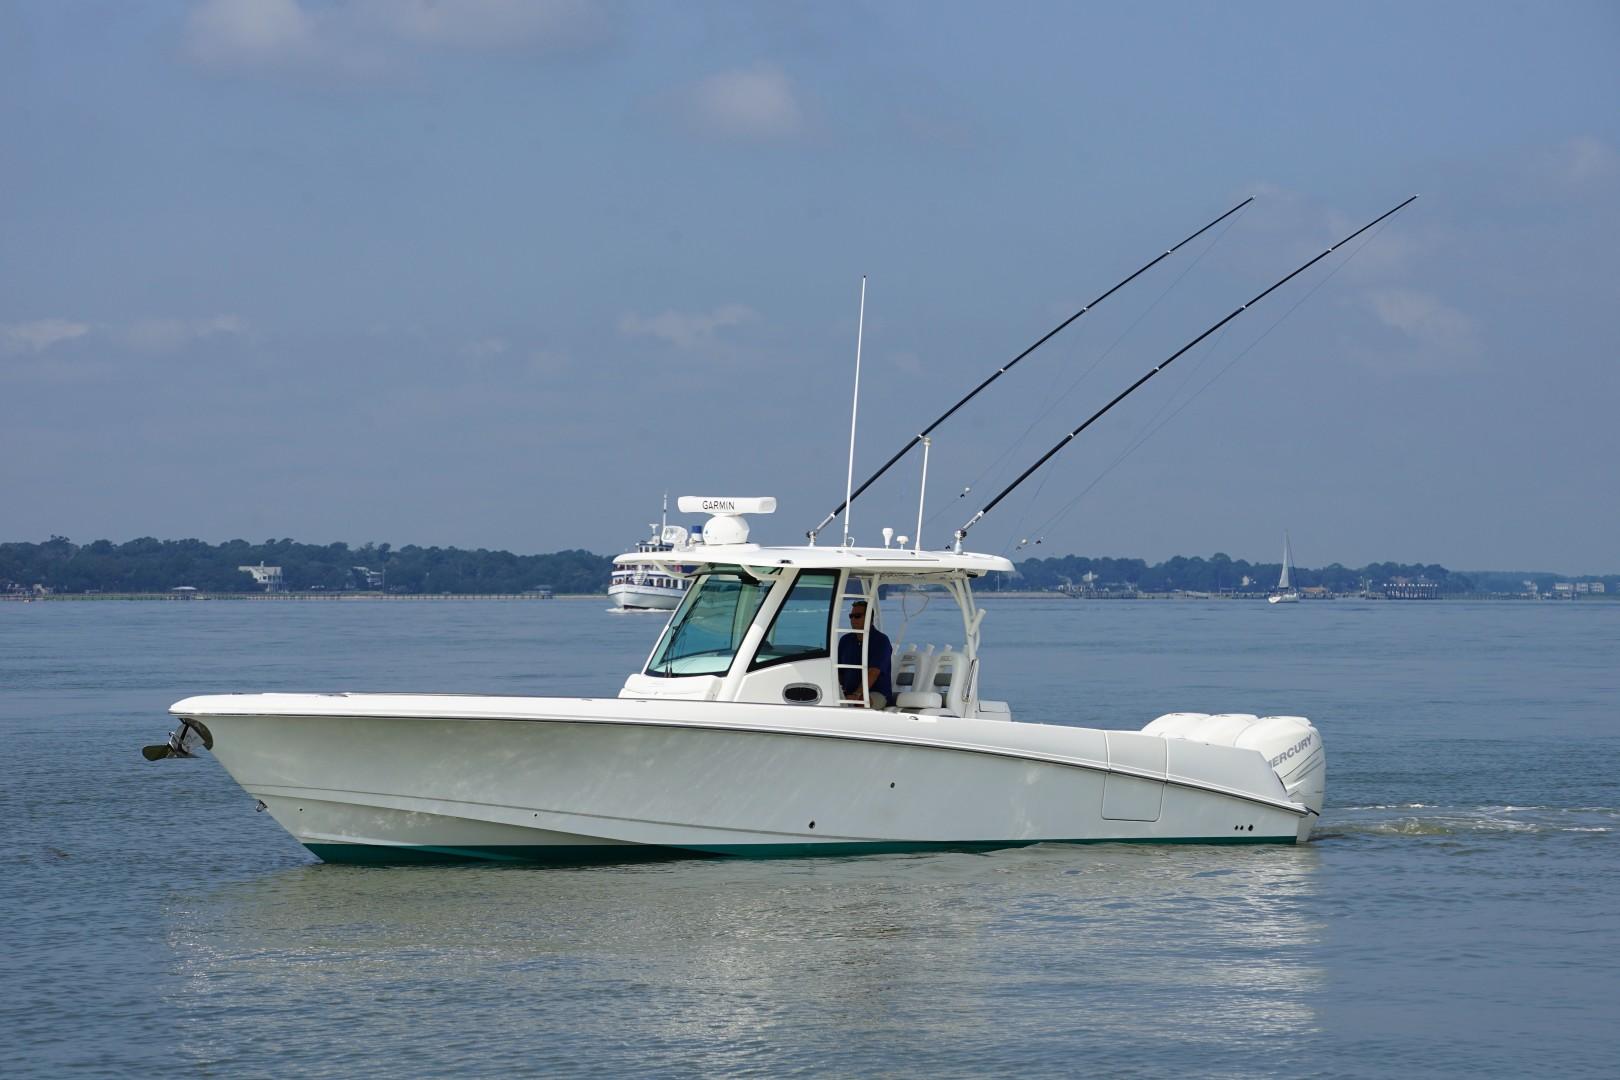 Boston Whaler 35 - Sandra C - profile